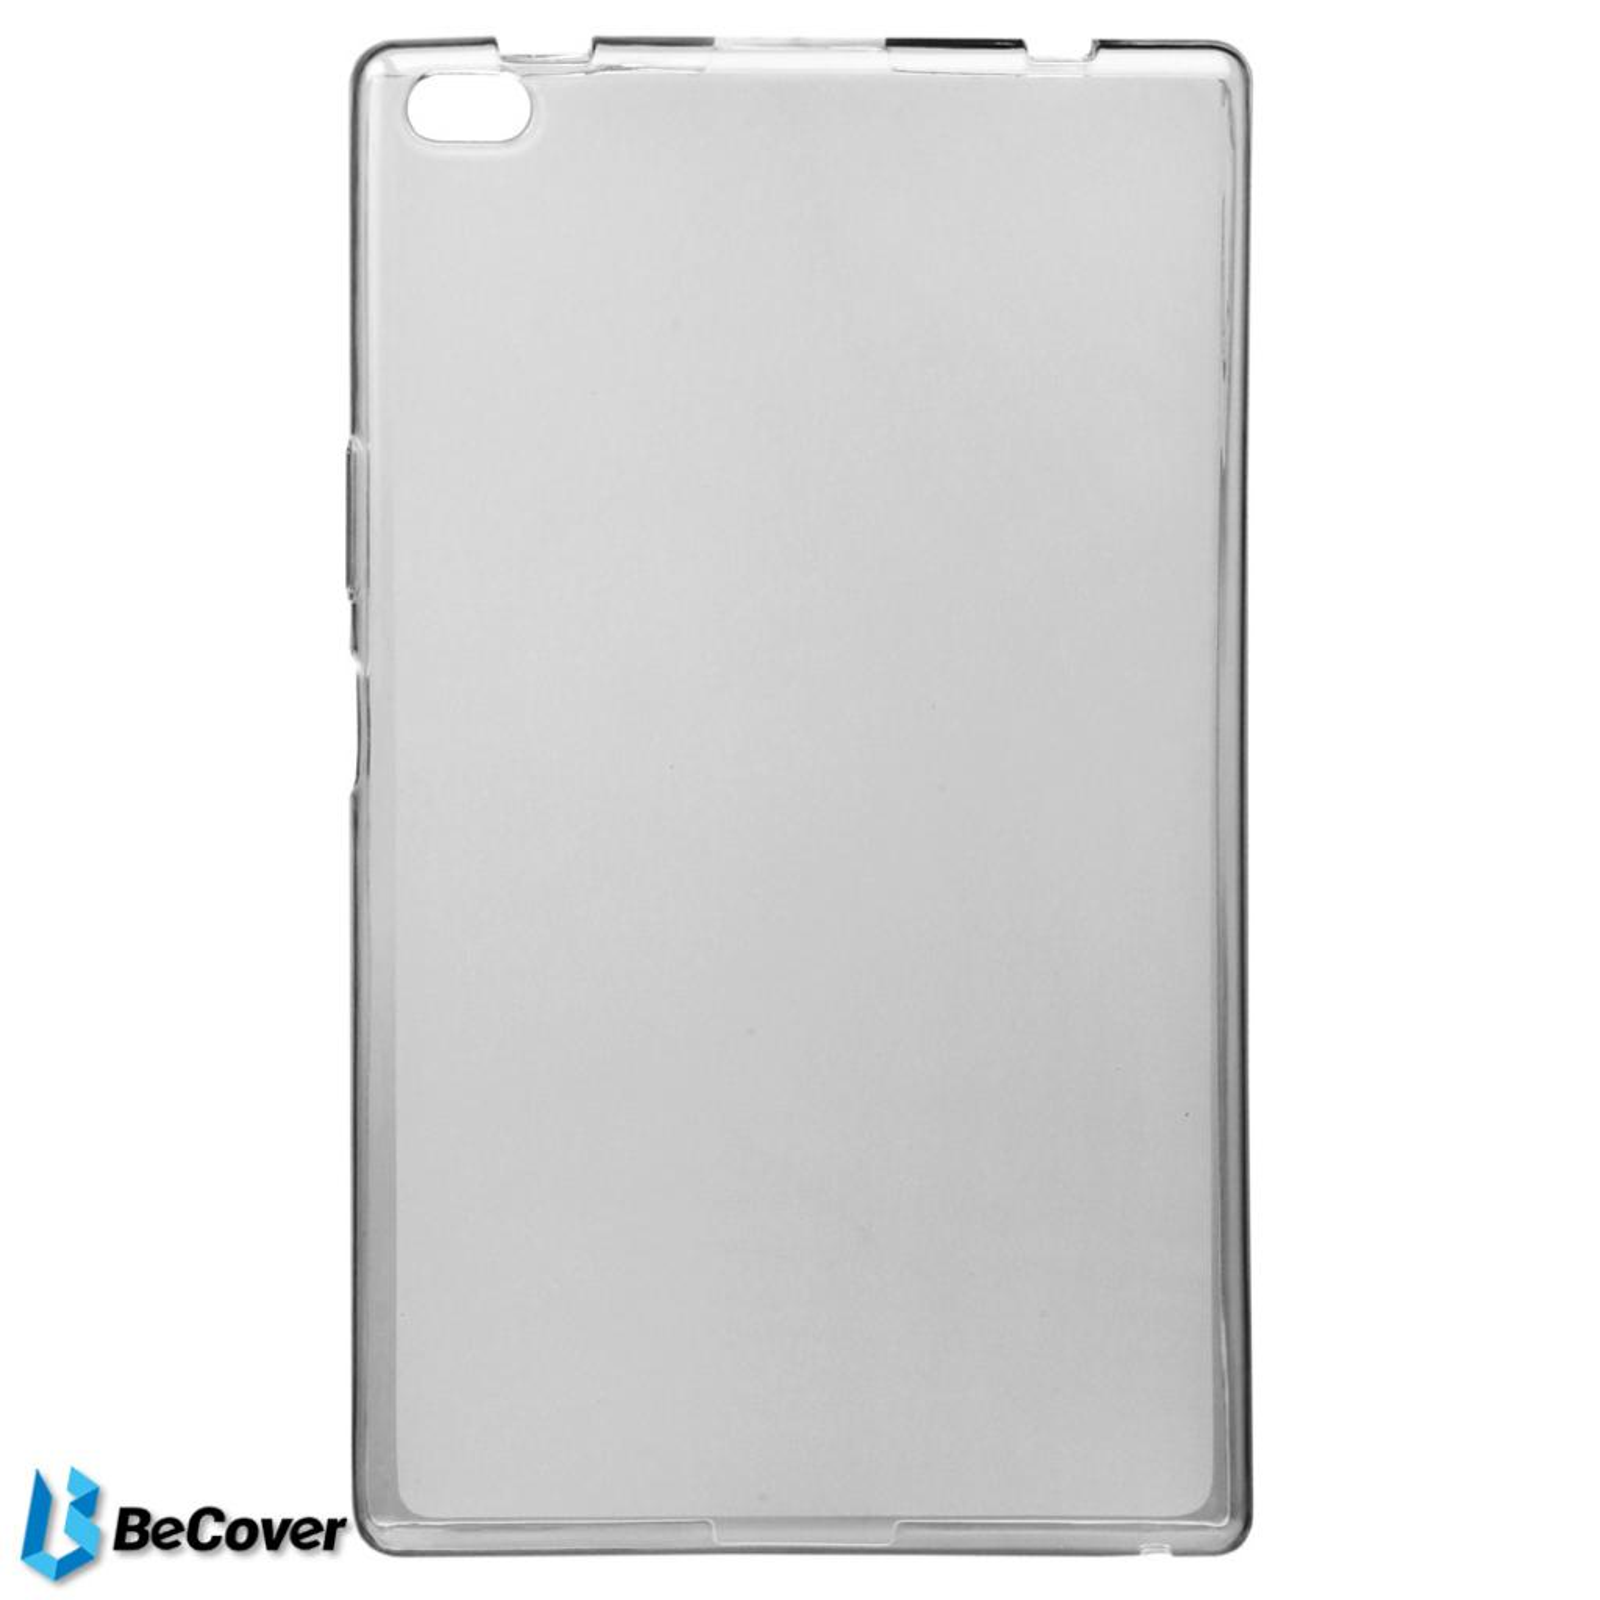 Чехол для планшета BeCover Lenovo Tab 4 8.0 TB-8504 Transparancy (701743)